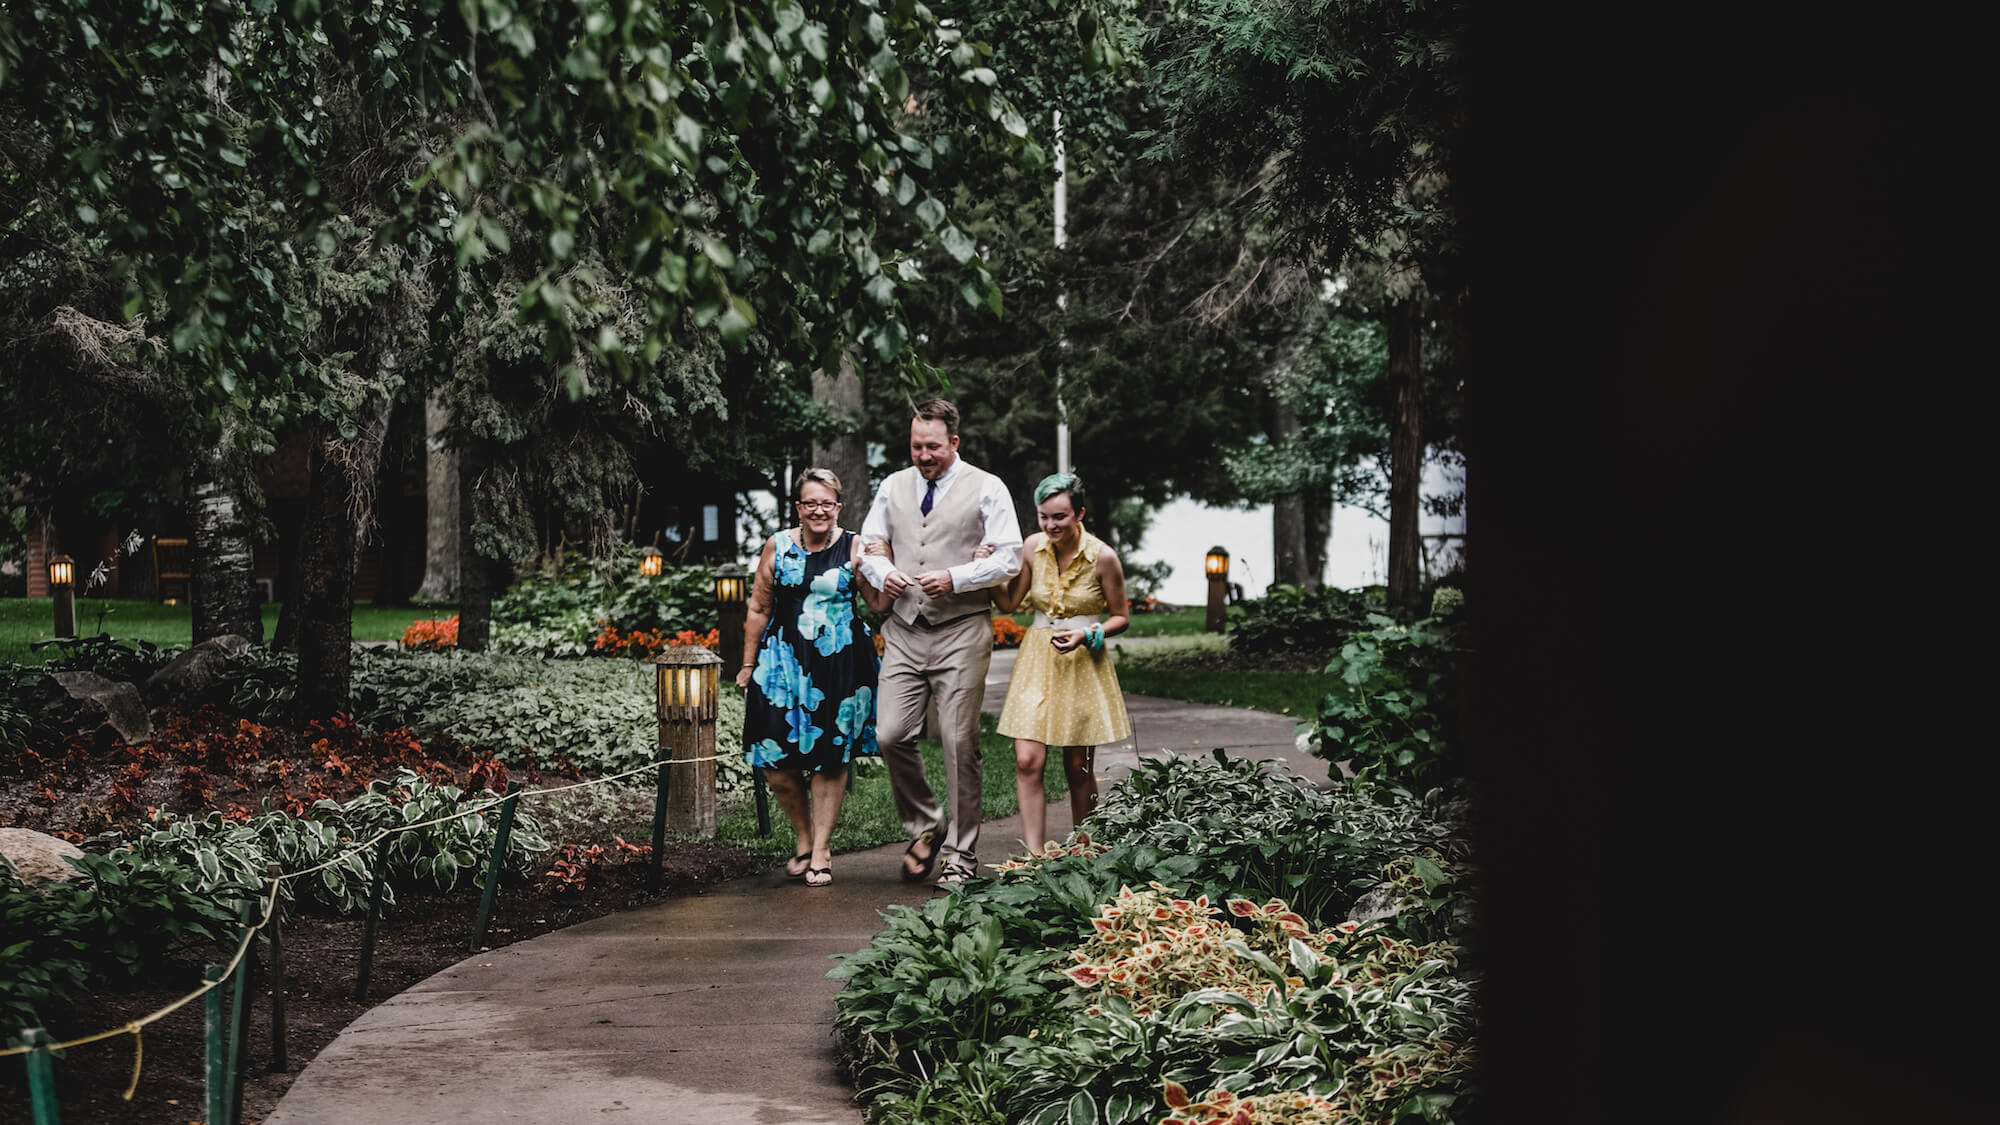 engle-olson-maddy-pat-mn-wedding-photography-14.jpg